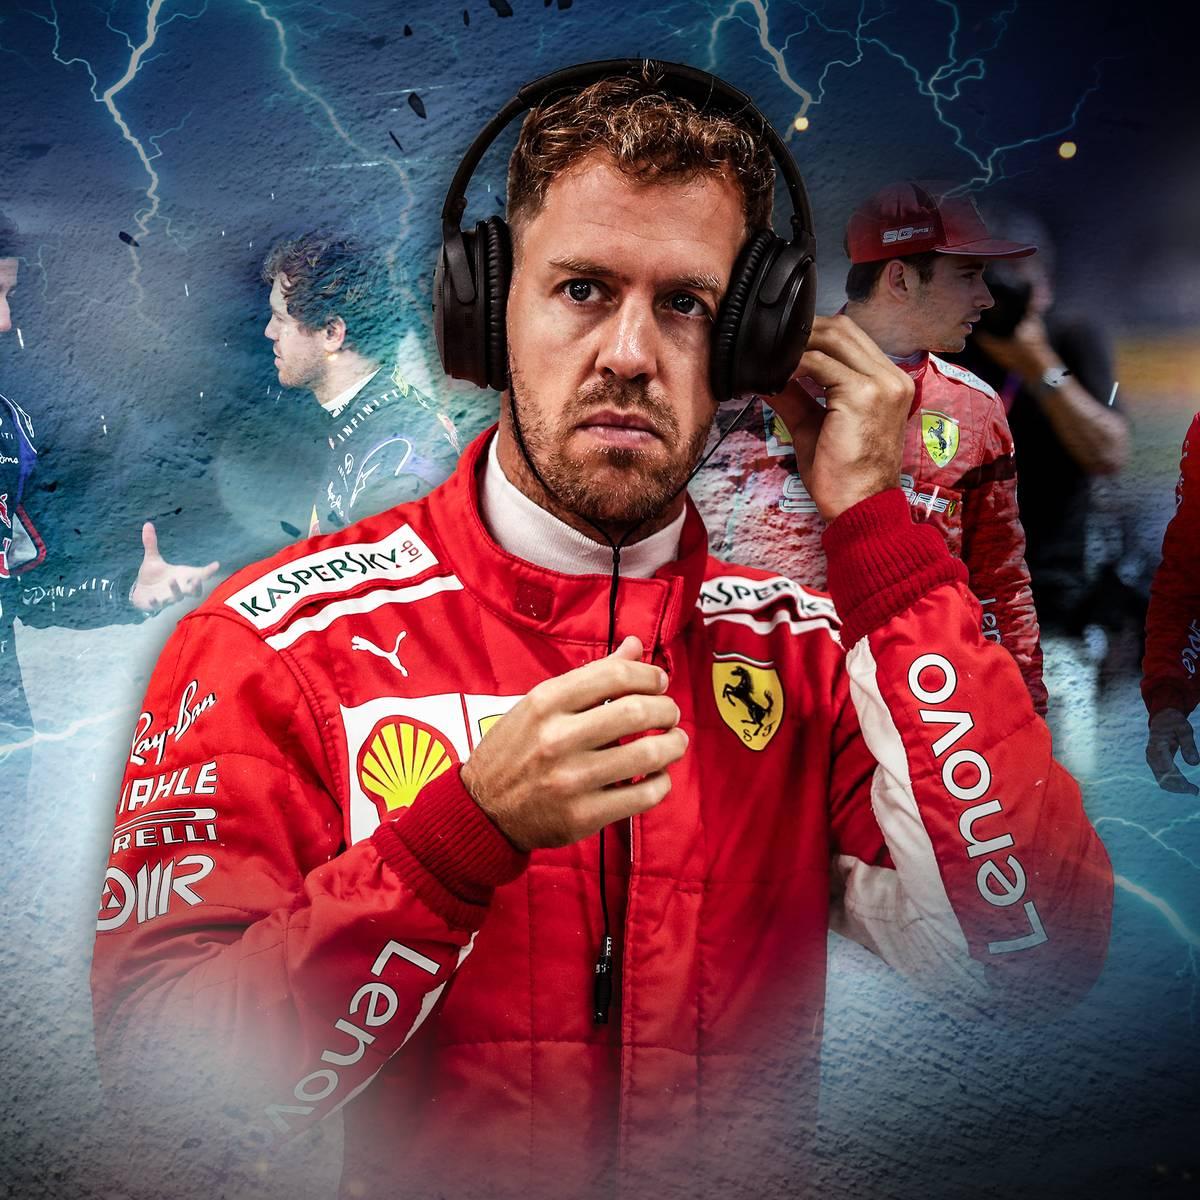 Leclerc macht Druck - flieht Vettel?